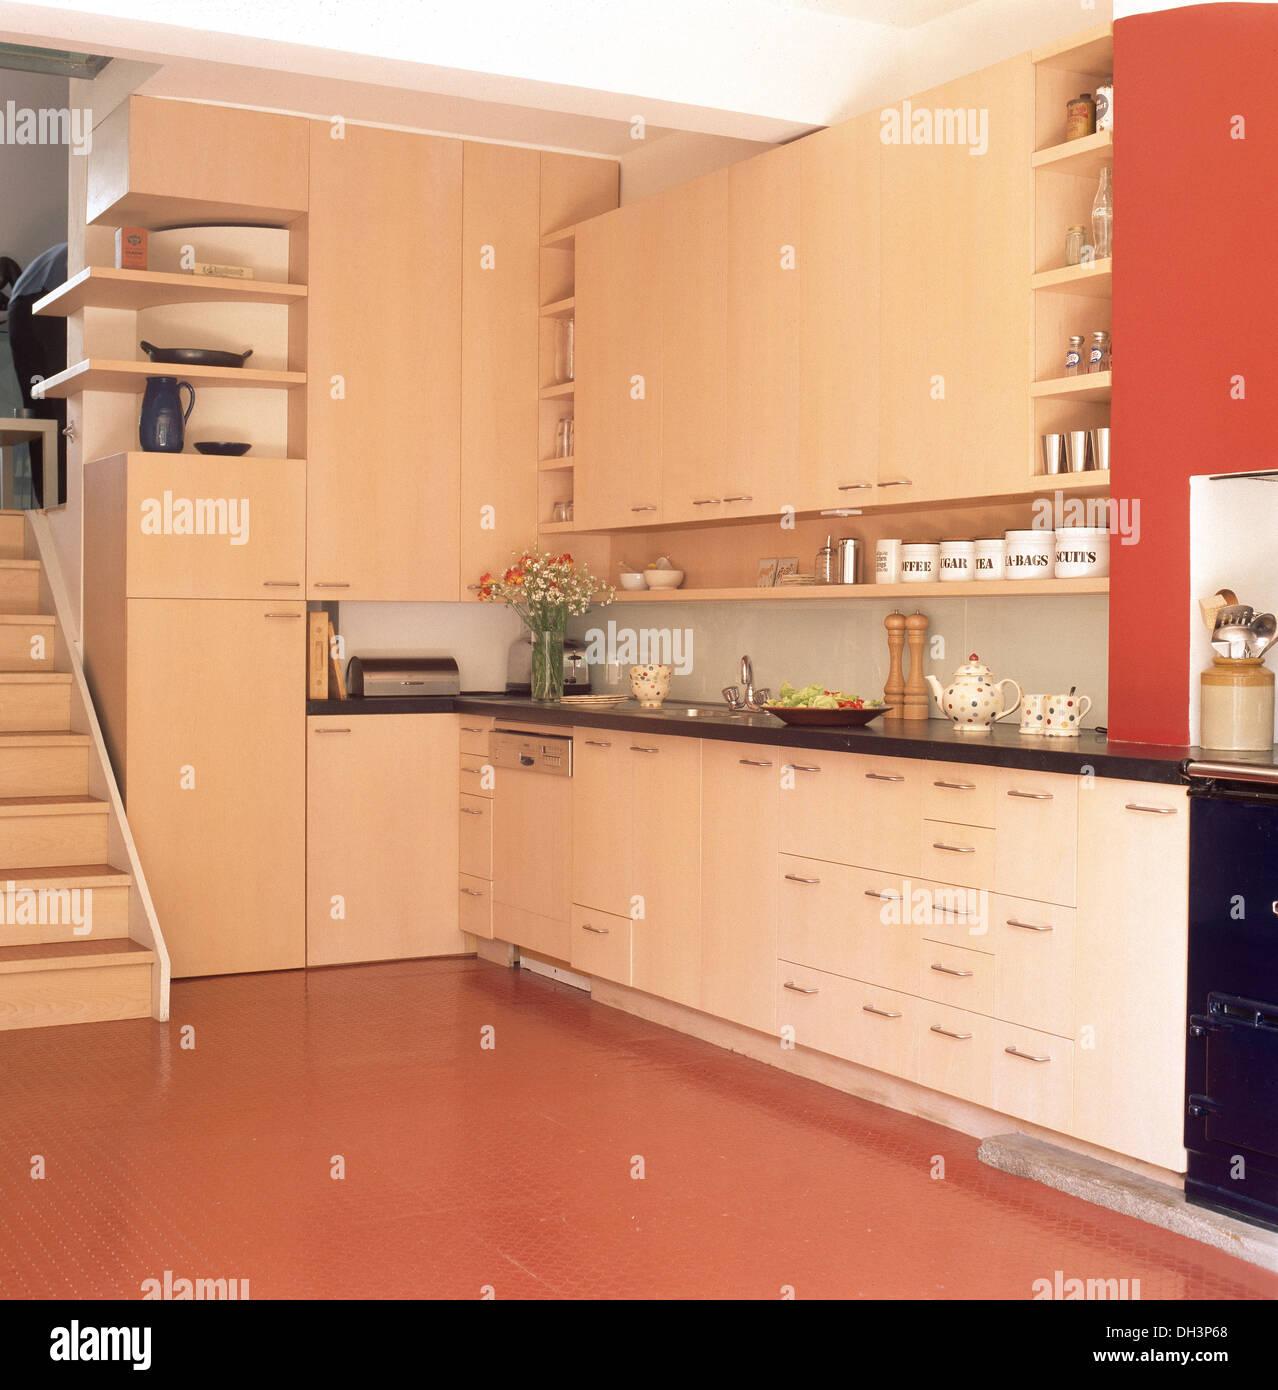 Terracotta Kitchen Floor Terracotta Tiled Floor In Modern Basement Kitchen With